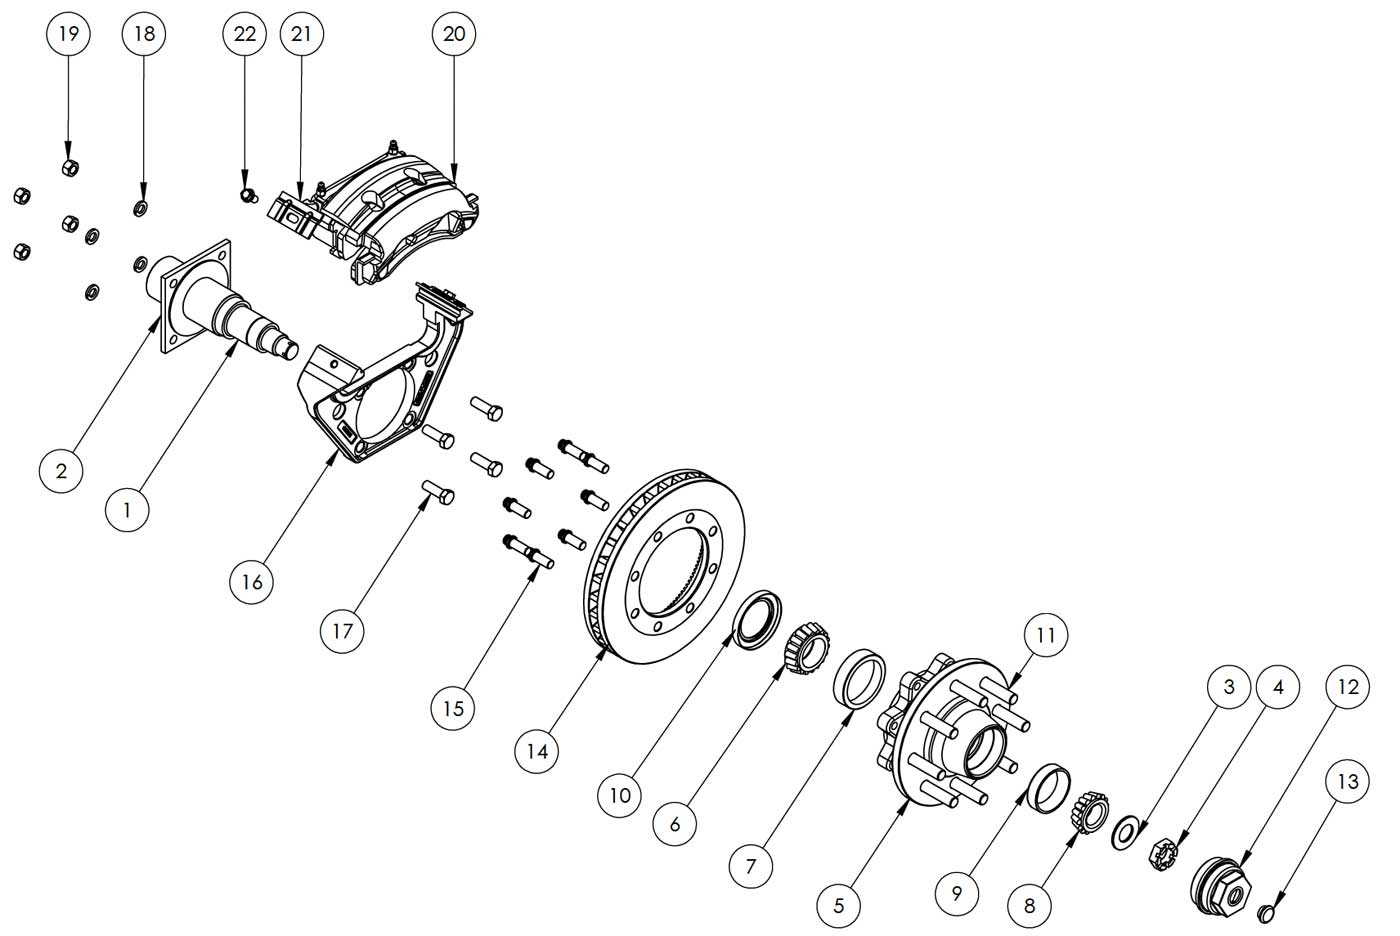 Kodiak 8k hd 116 inch rotor disc brake kits and replacement parts kodiak al korockwell 8k hd 116 inch disc brake parts illustration publicscrutiny Gallery